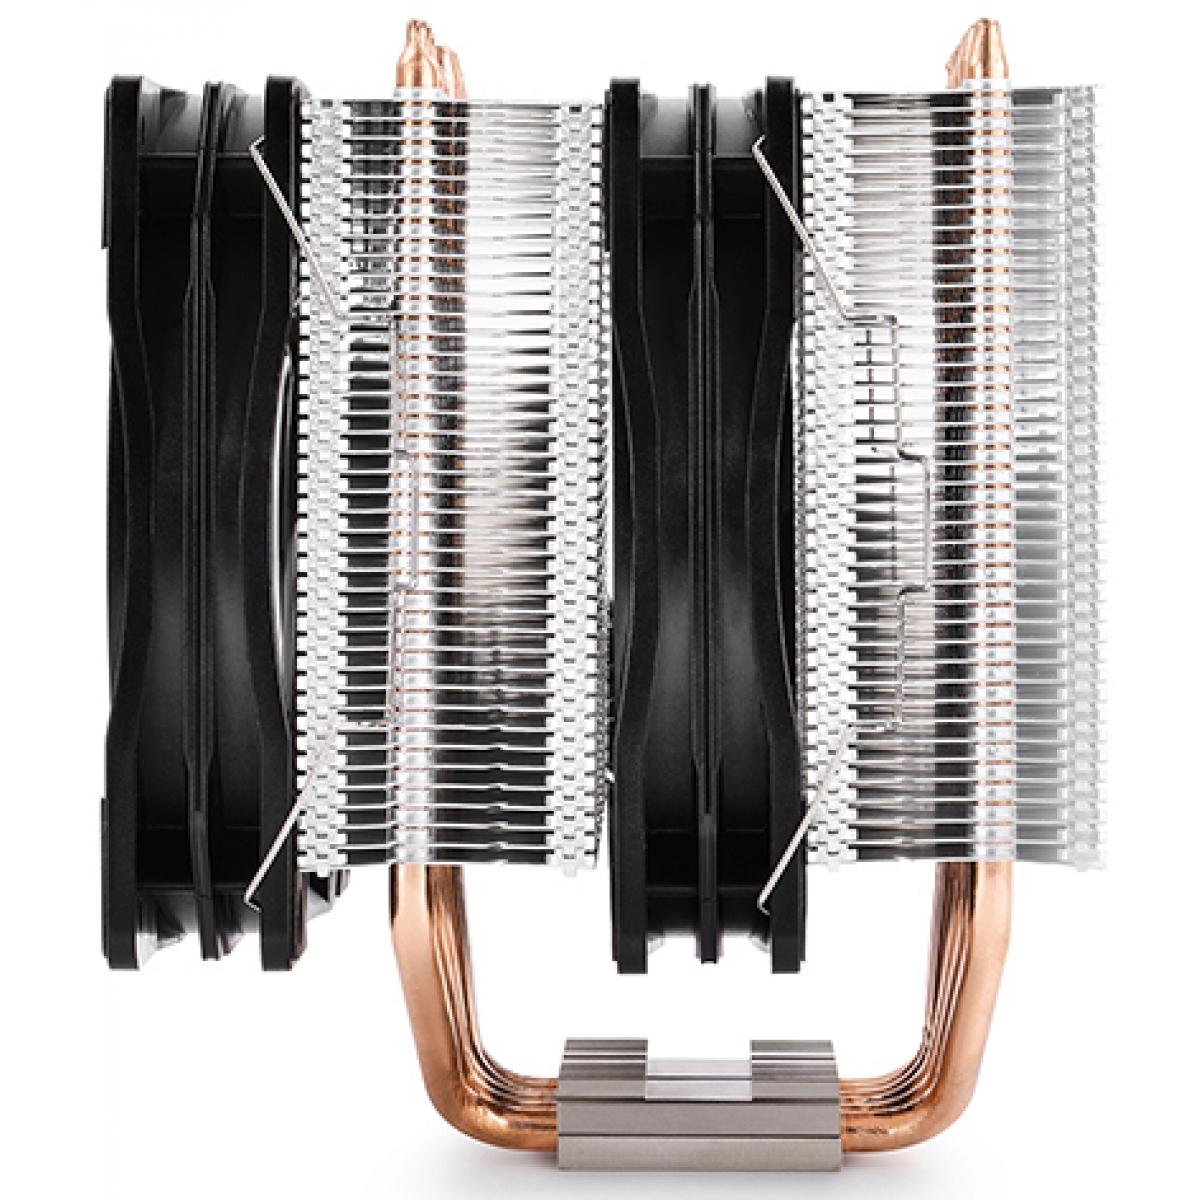 Cooler para Processador DeepCool Neptwin, RGB 120mm, Intel-AMD, DP-MCH6-NT-A4RGB